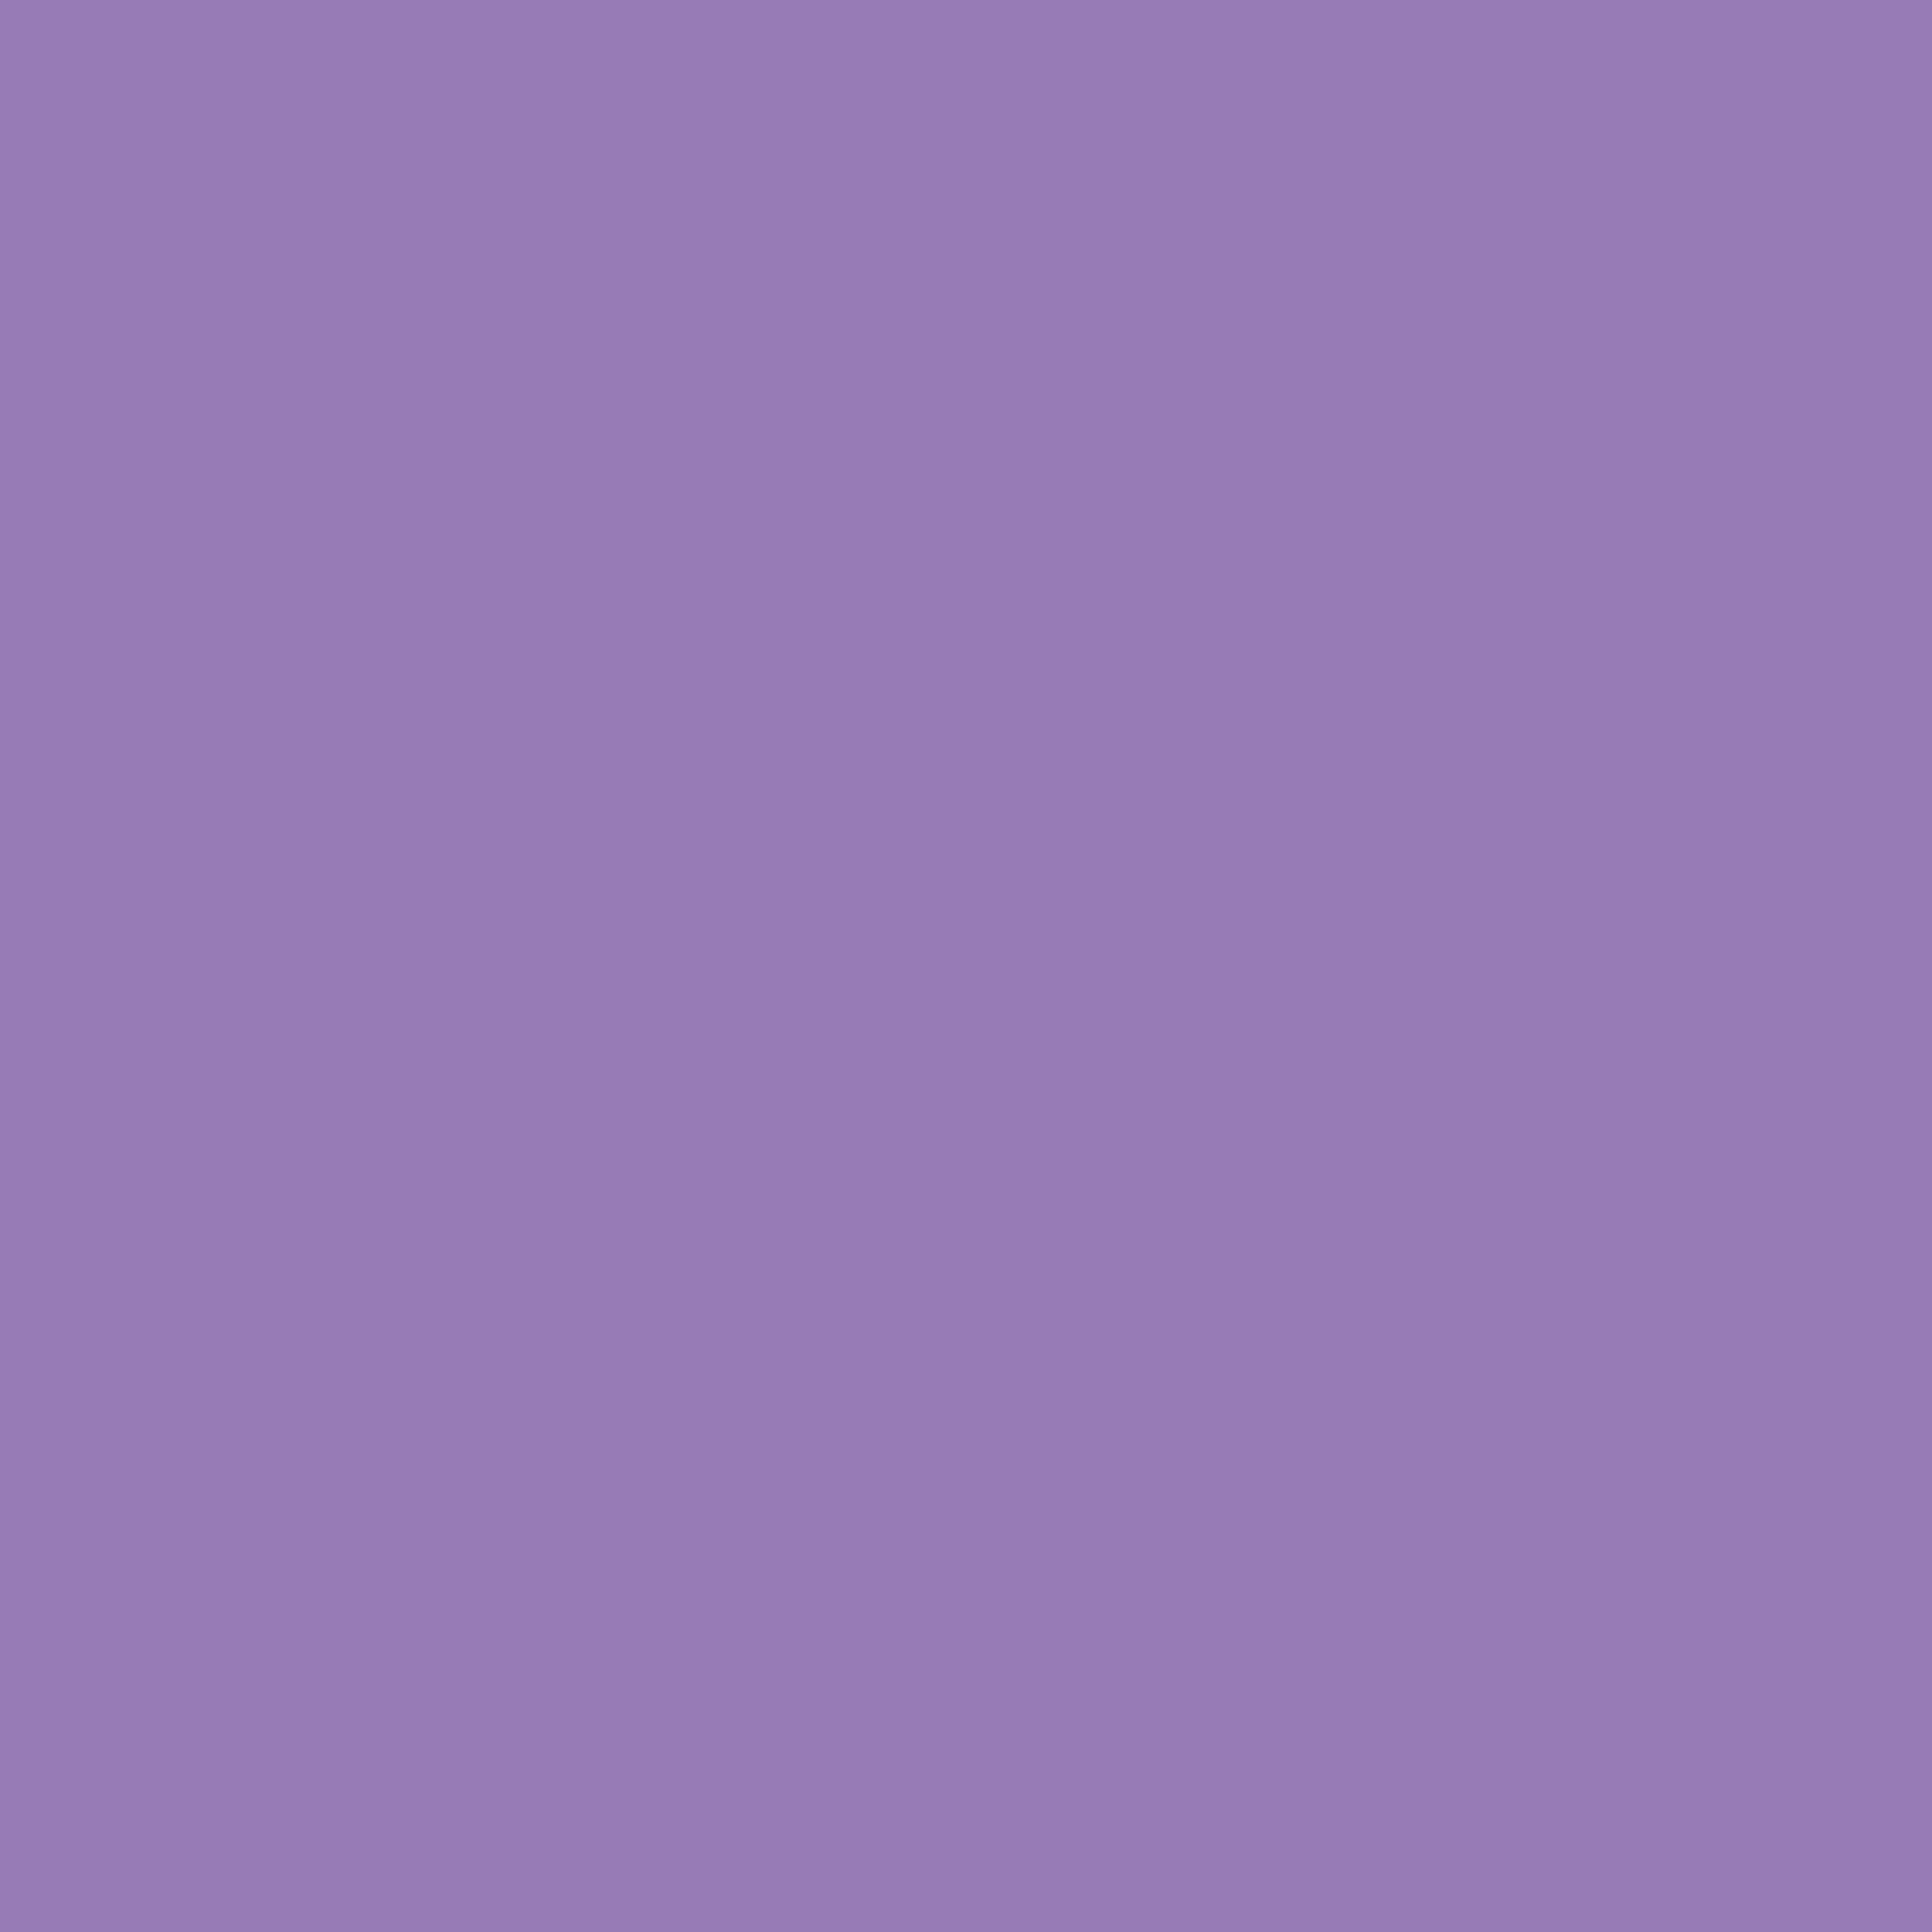 2048x2048 Lavender Purple Solid Color Background